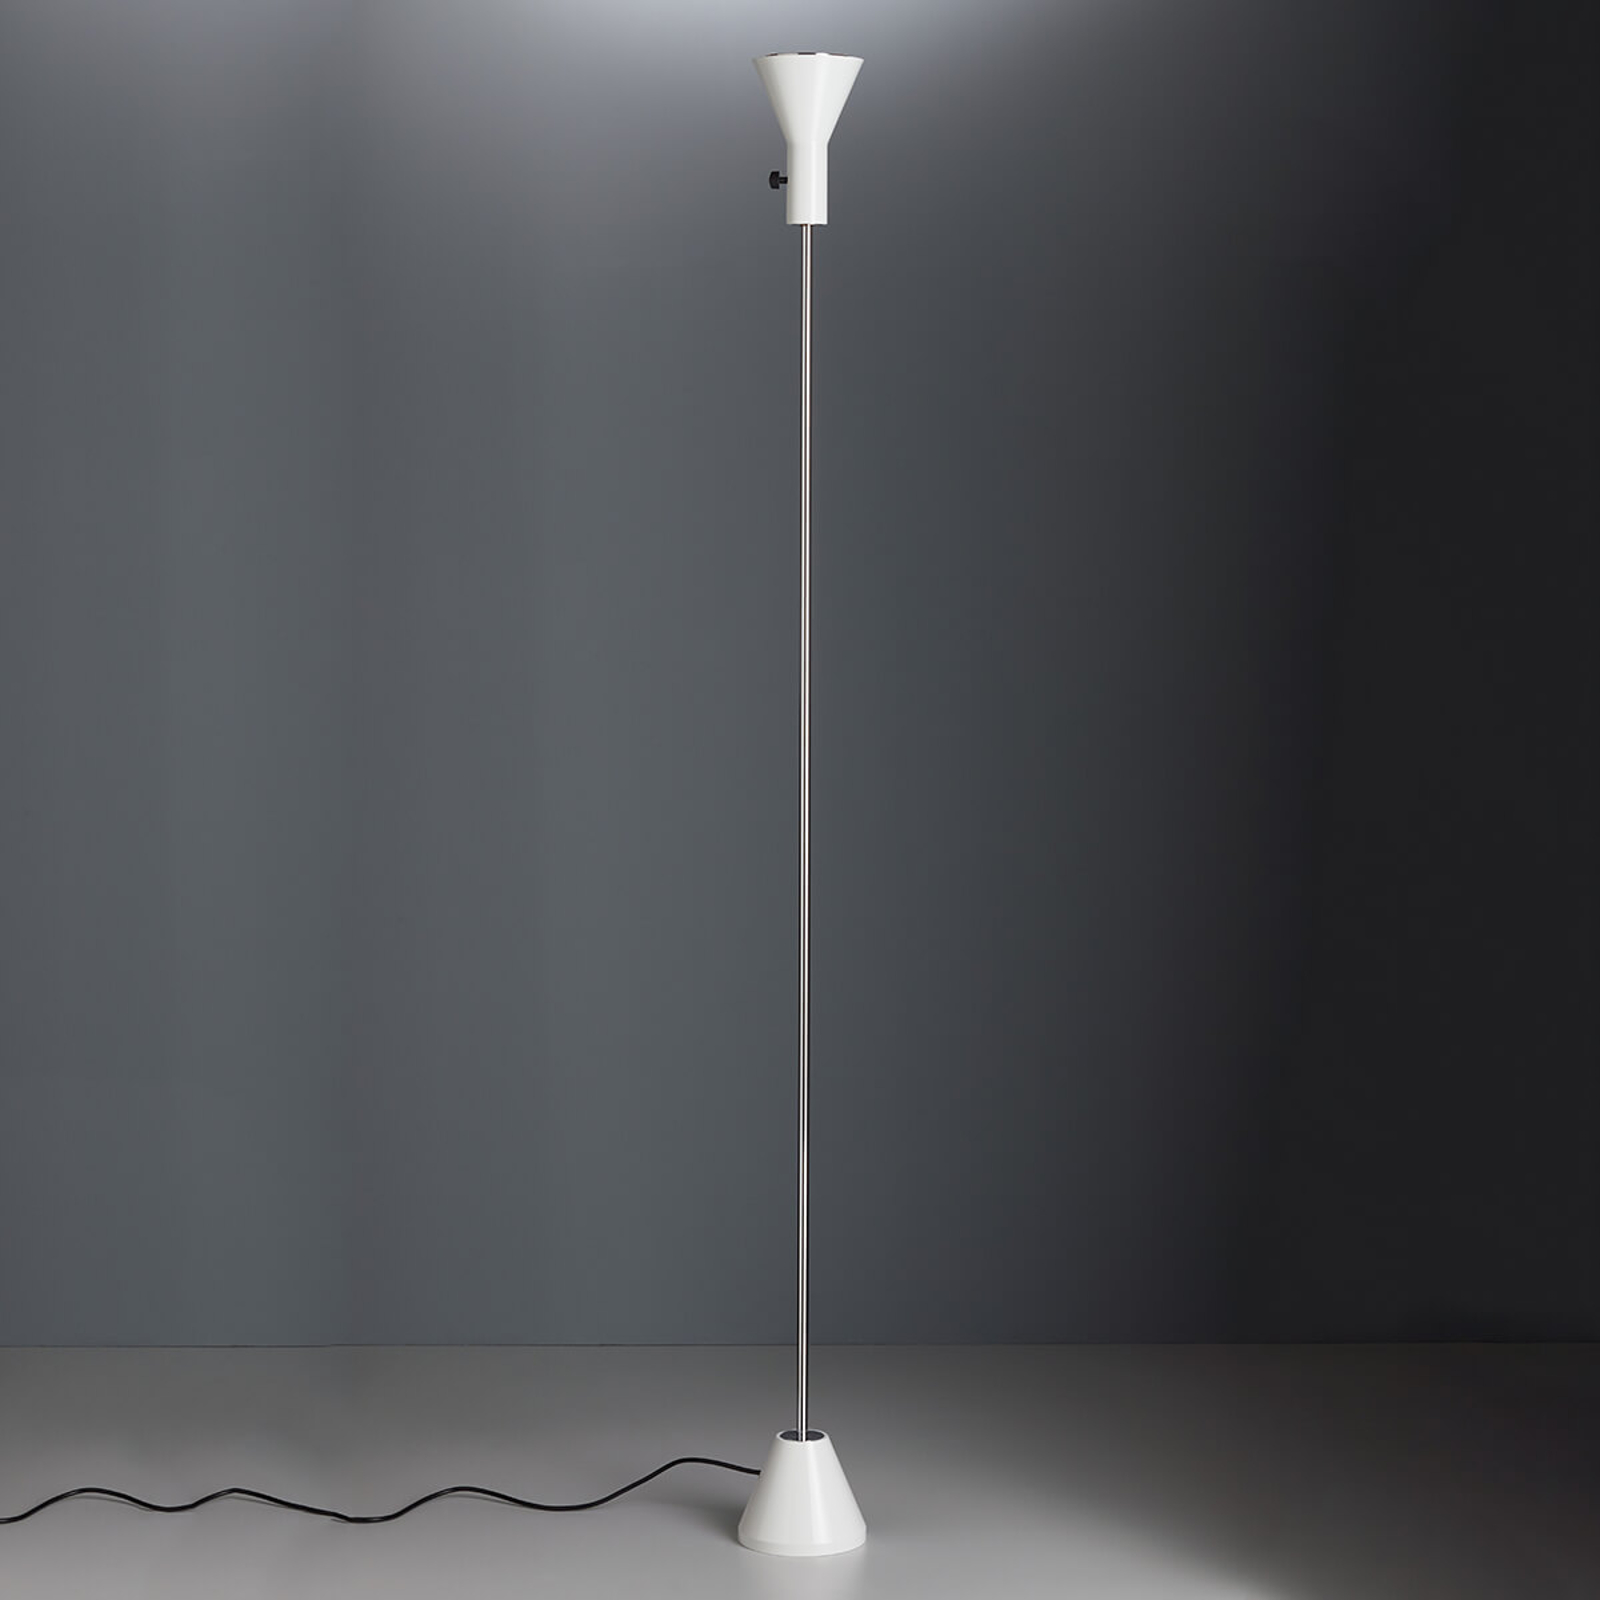 Witte designer vloerlamp Gru met led-licht